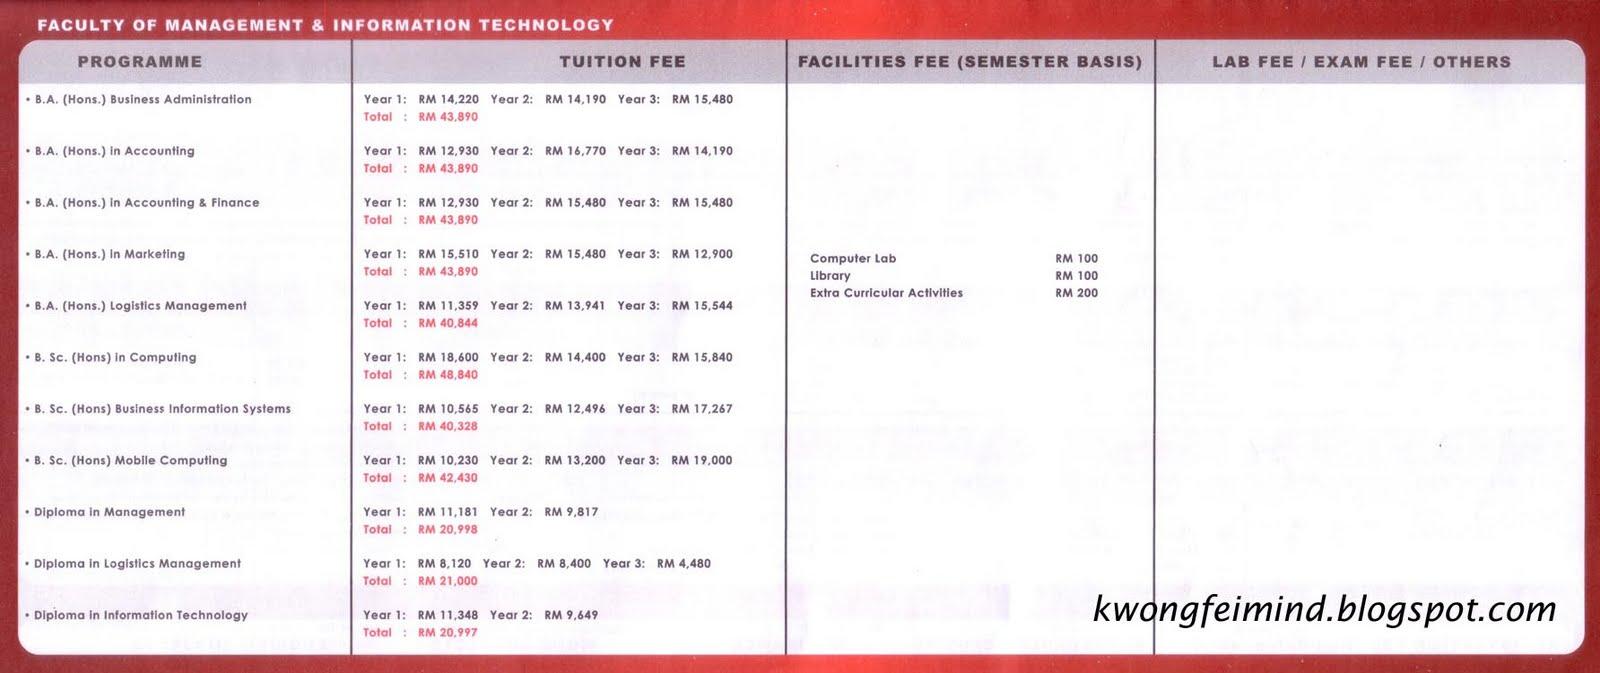 UCSI University Programmes Fee Schedule | Kwong Fei's Blog